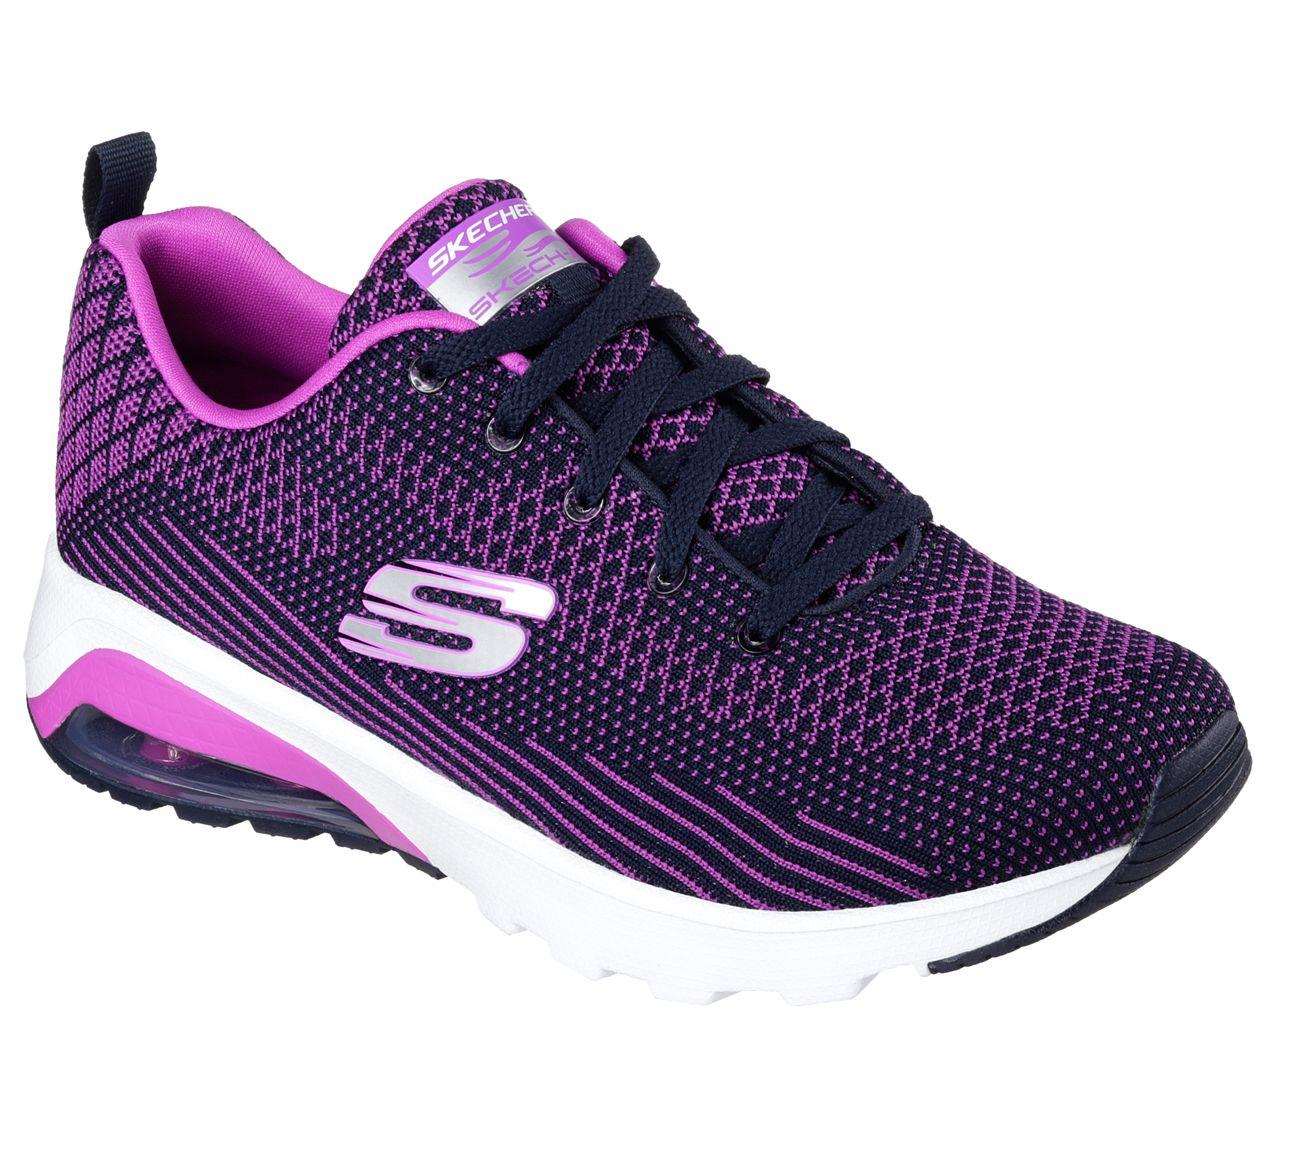 Skech Air Extreme Awaken Skechers Cushioned Heels Training Shoes